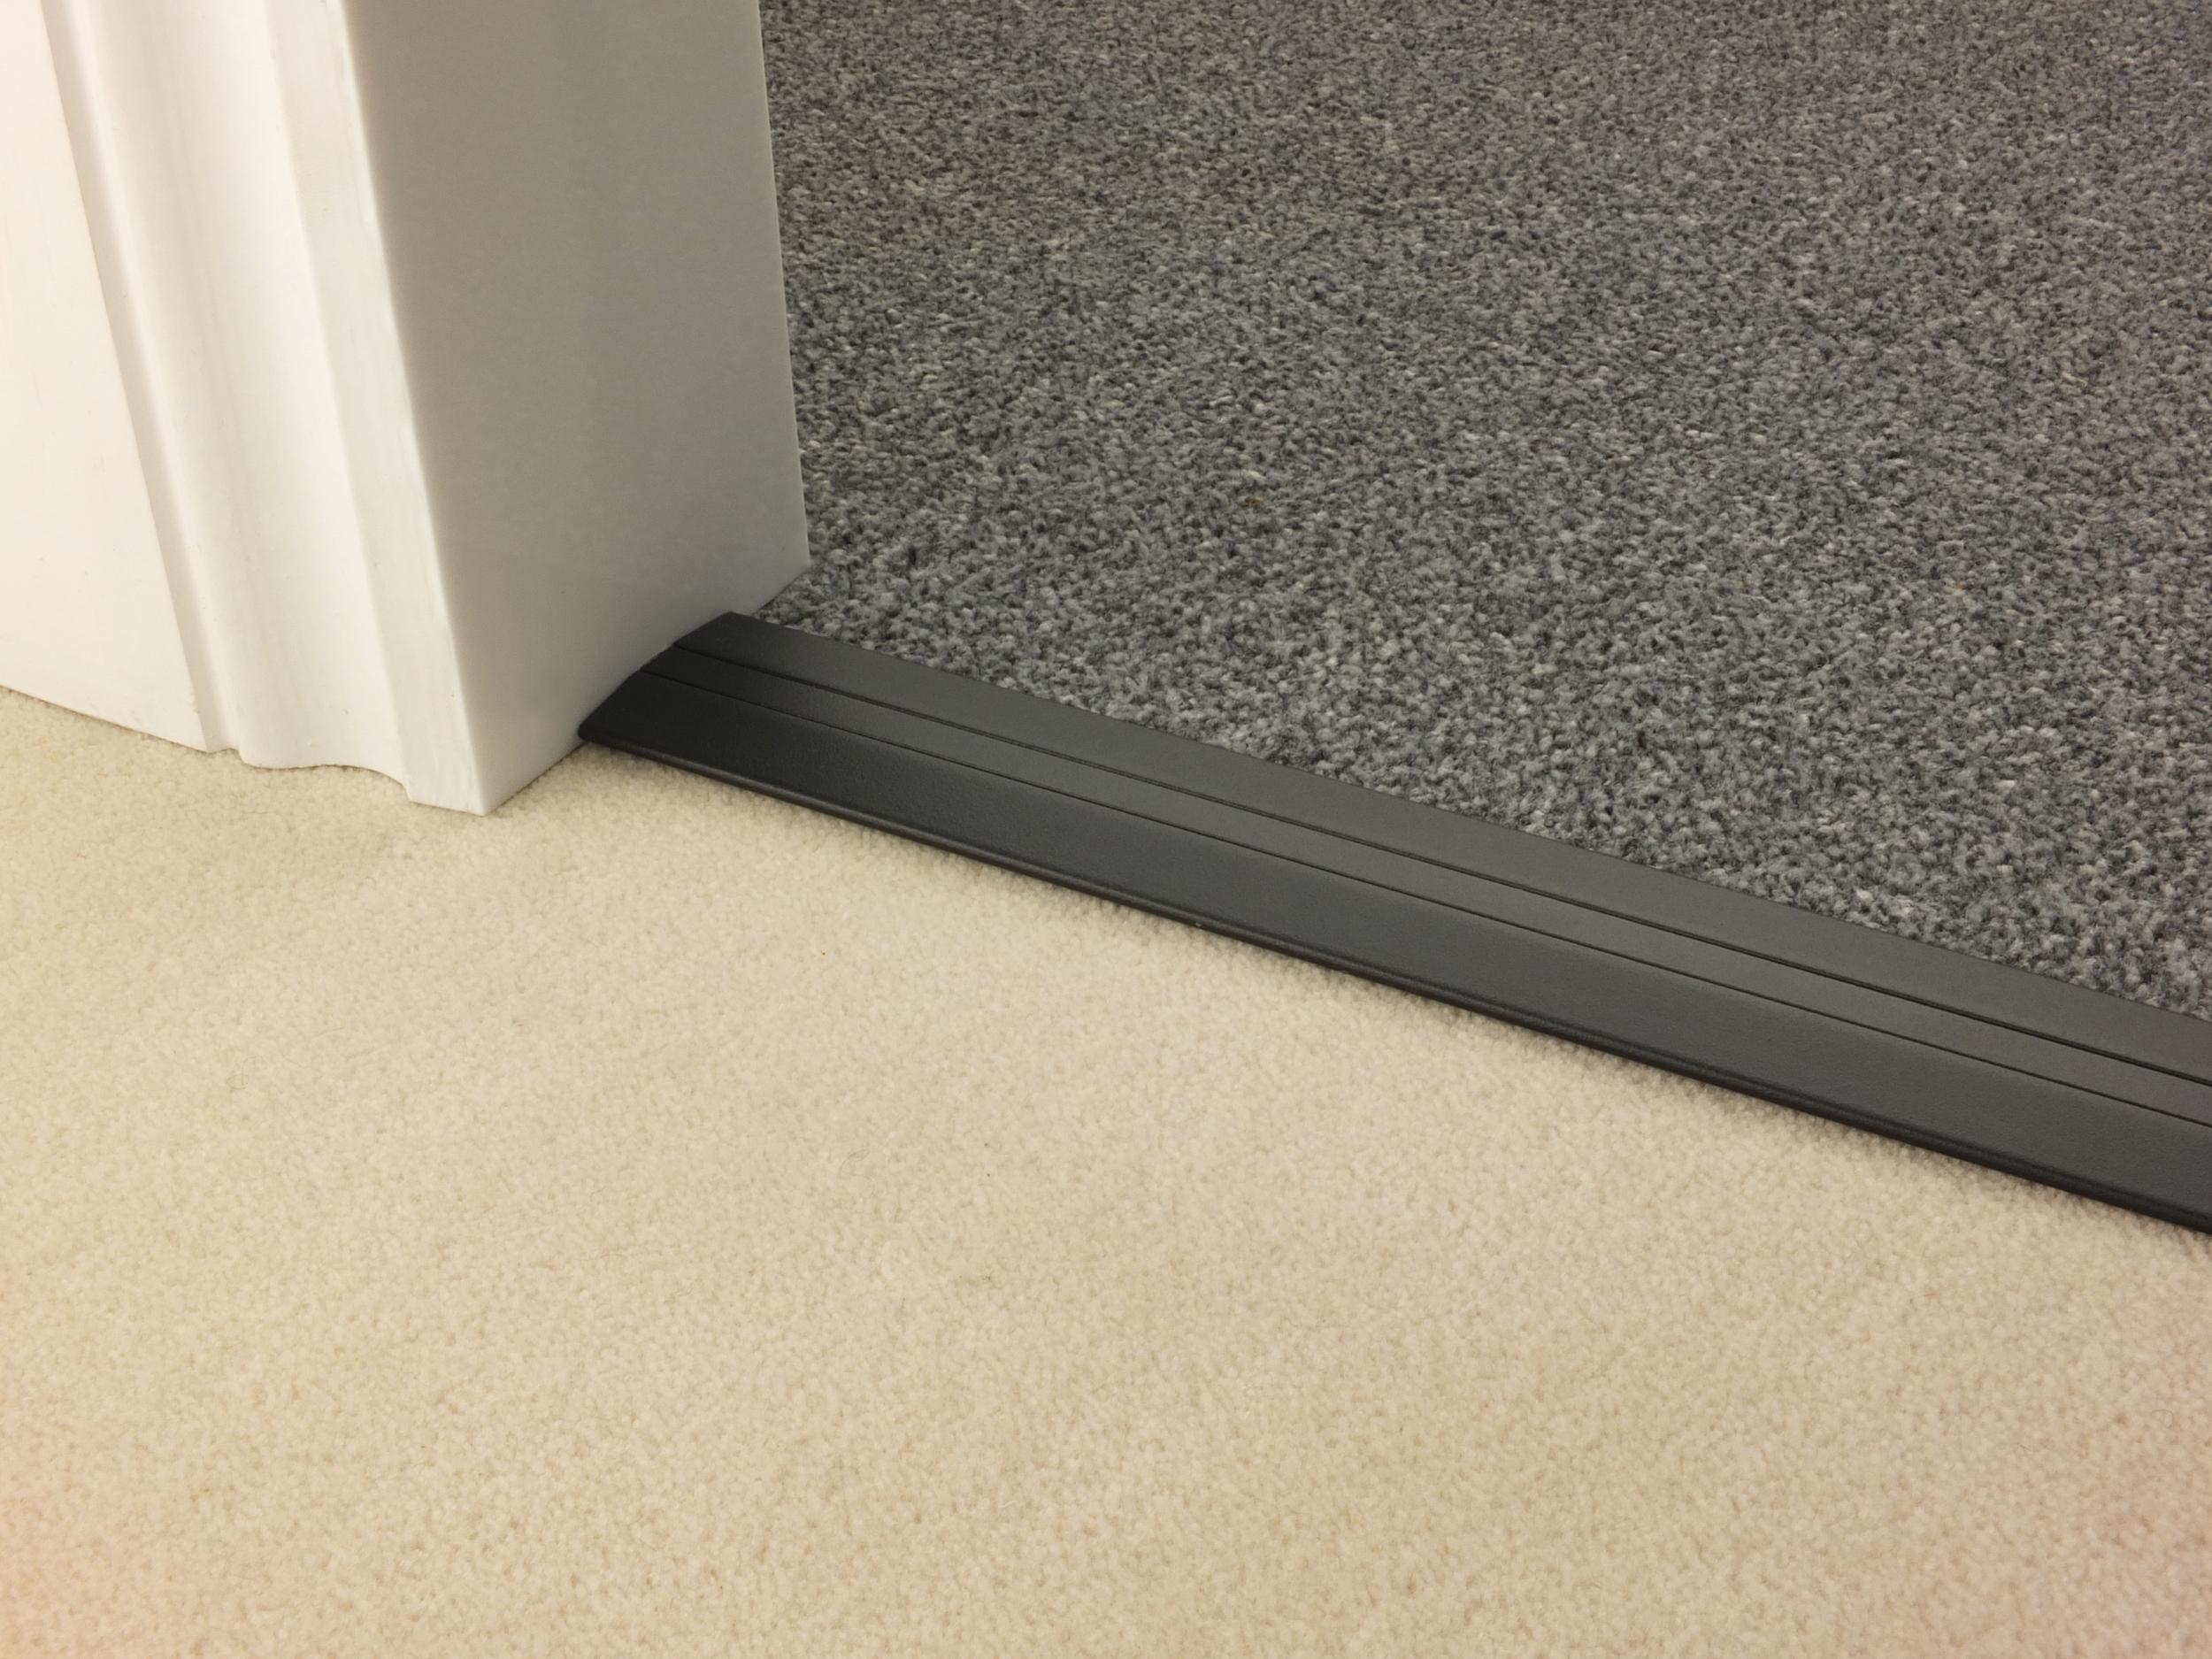 stairrods-doorbar-black-posh38-ctc.jpg